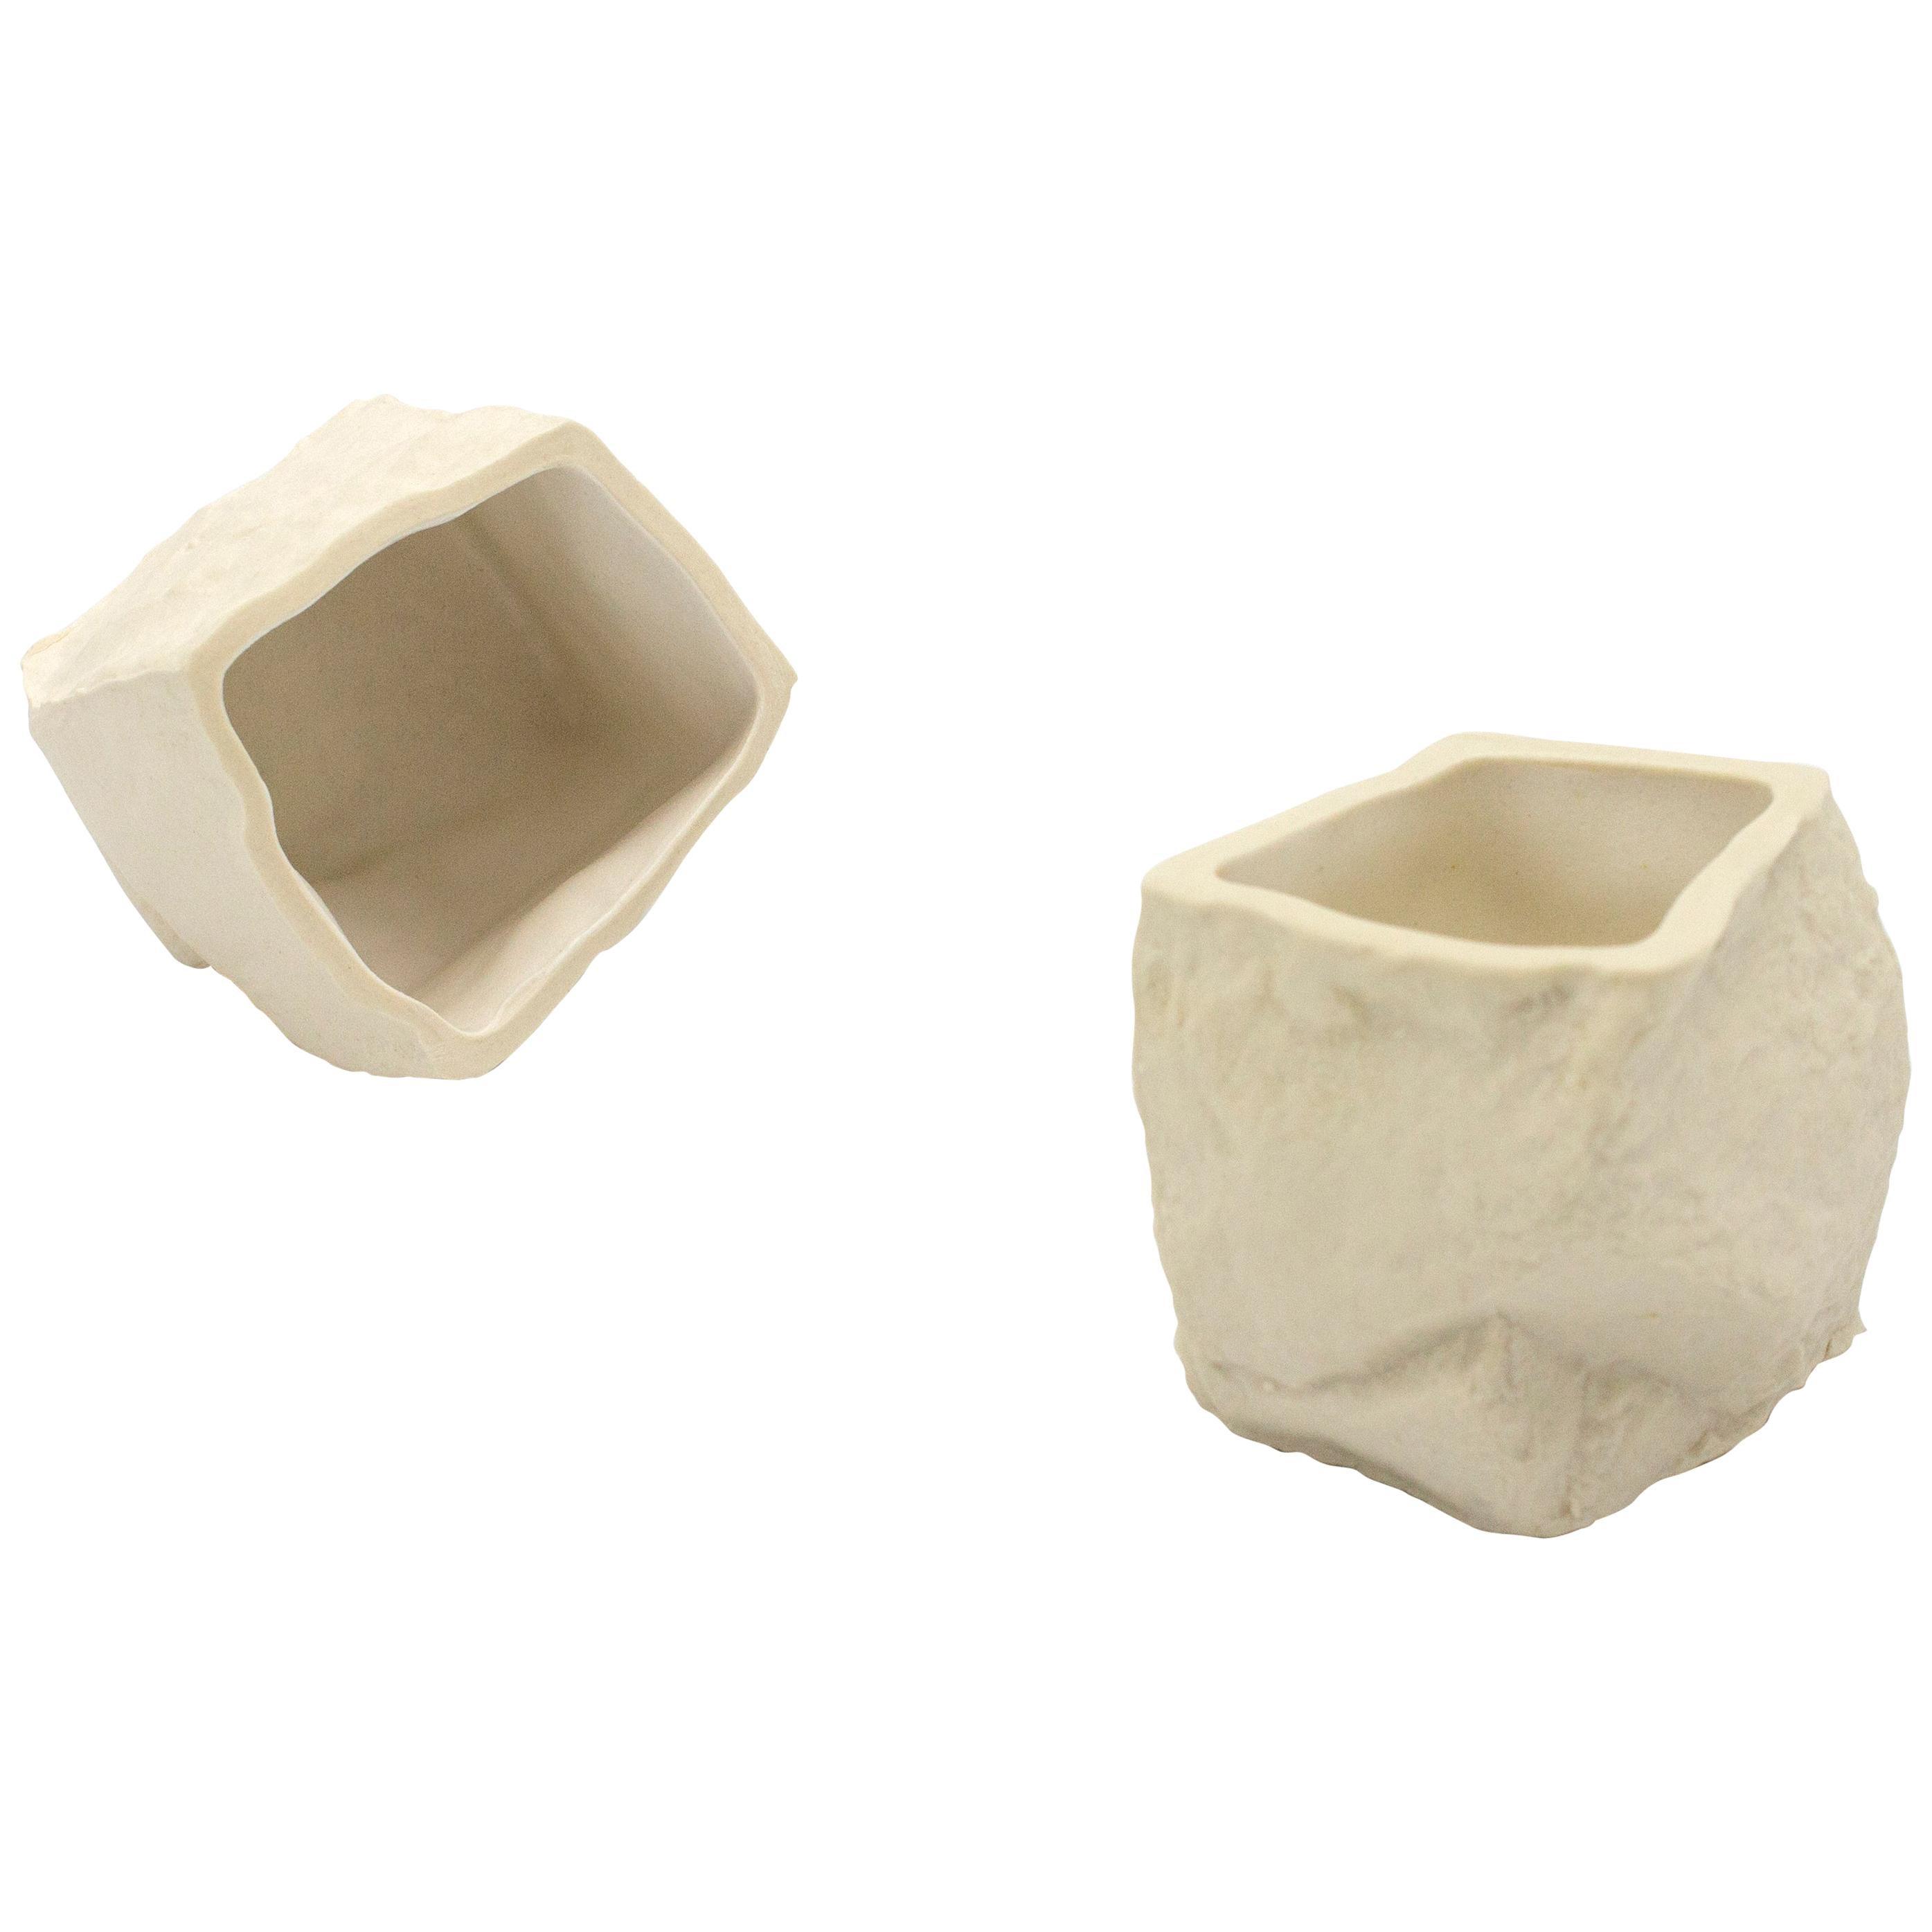 Set of 2 Cups by Craig Barrow